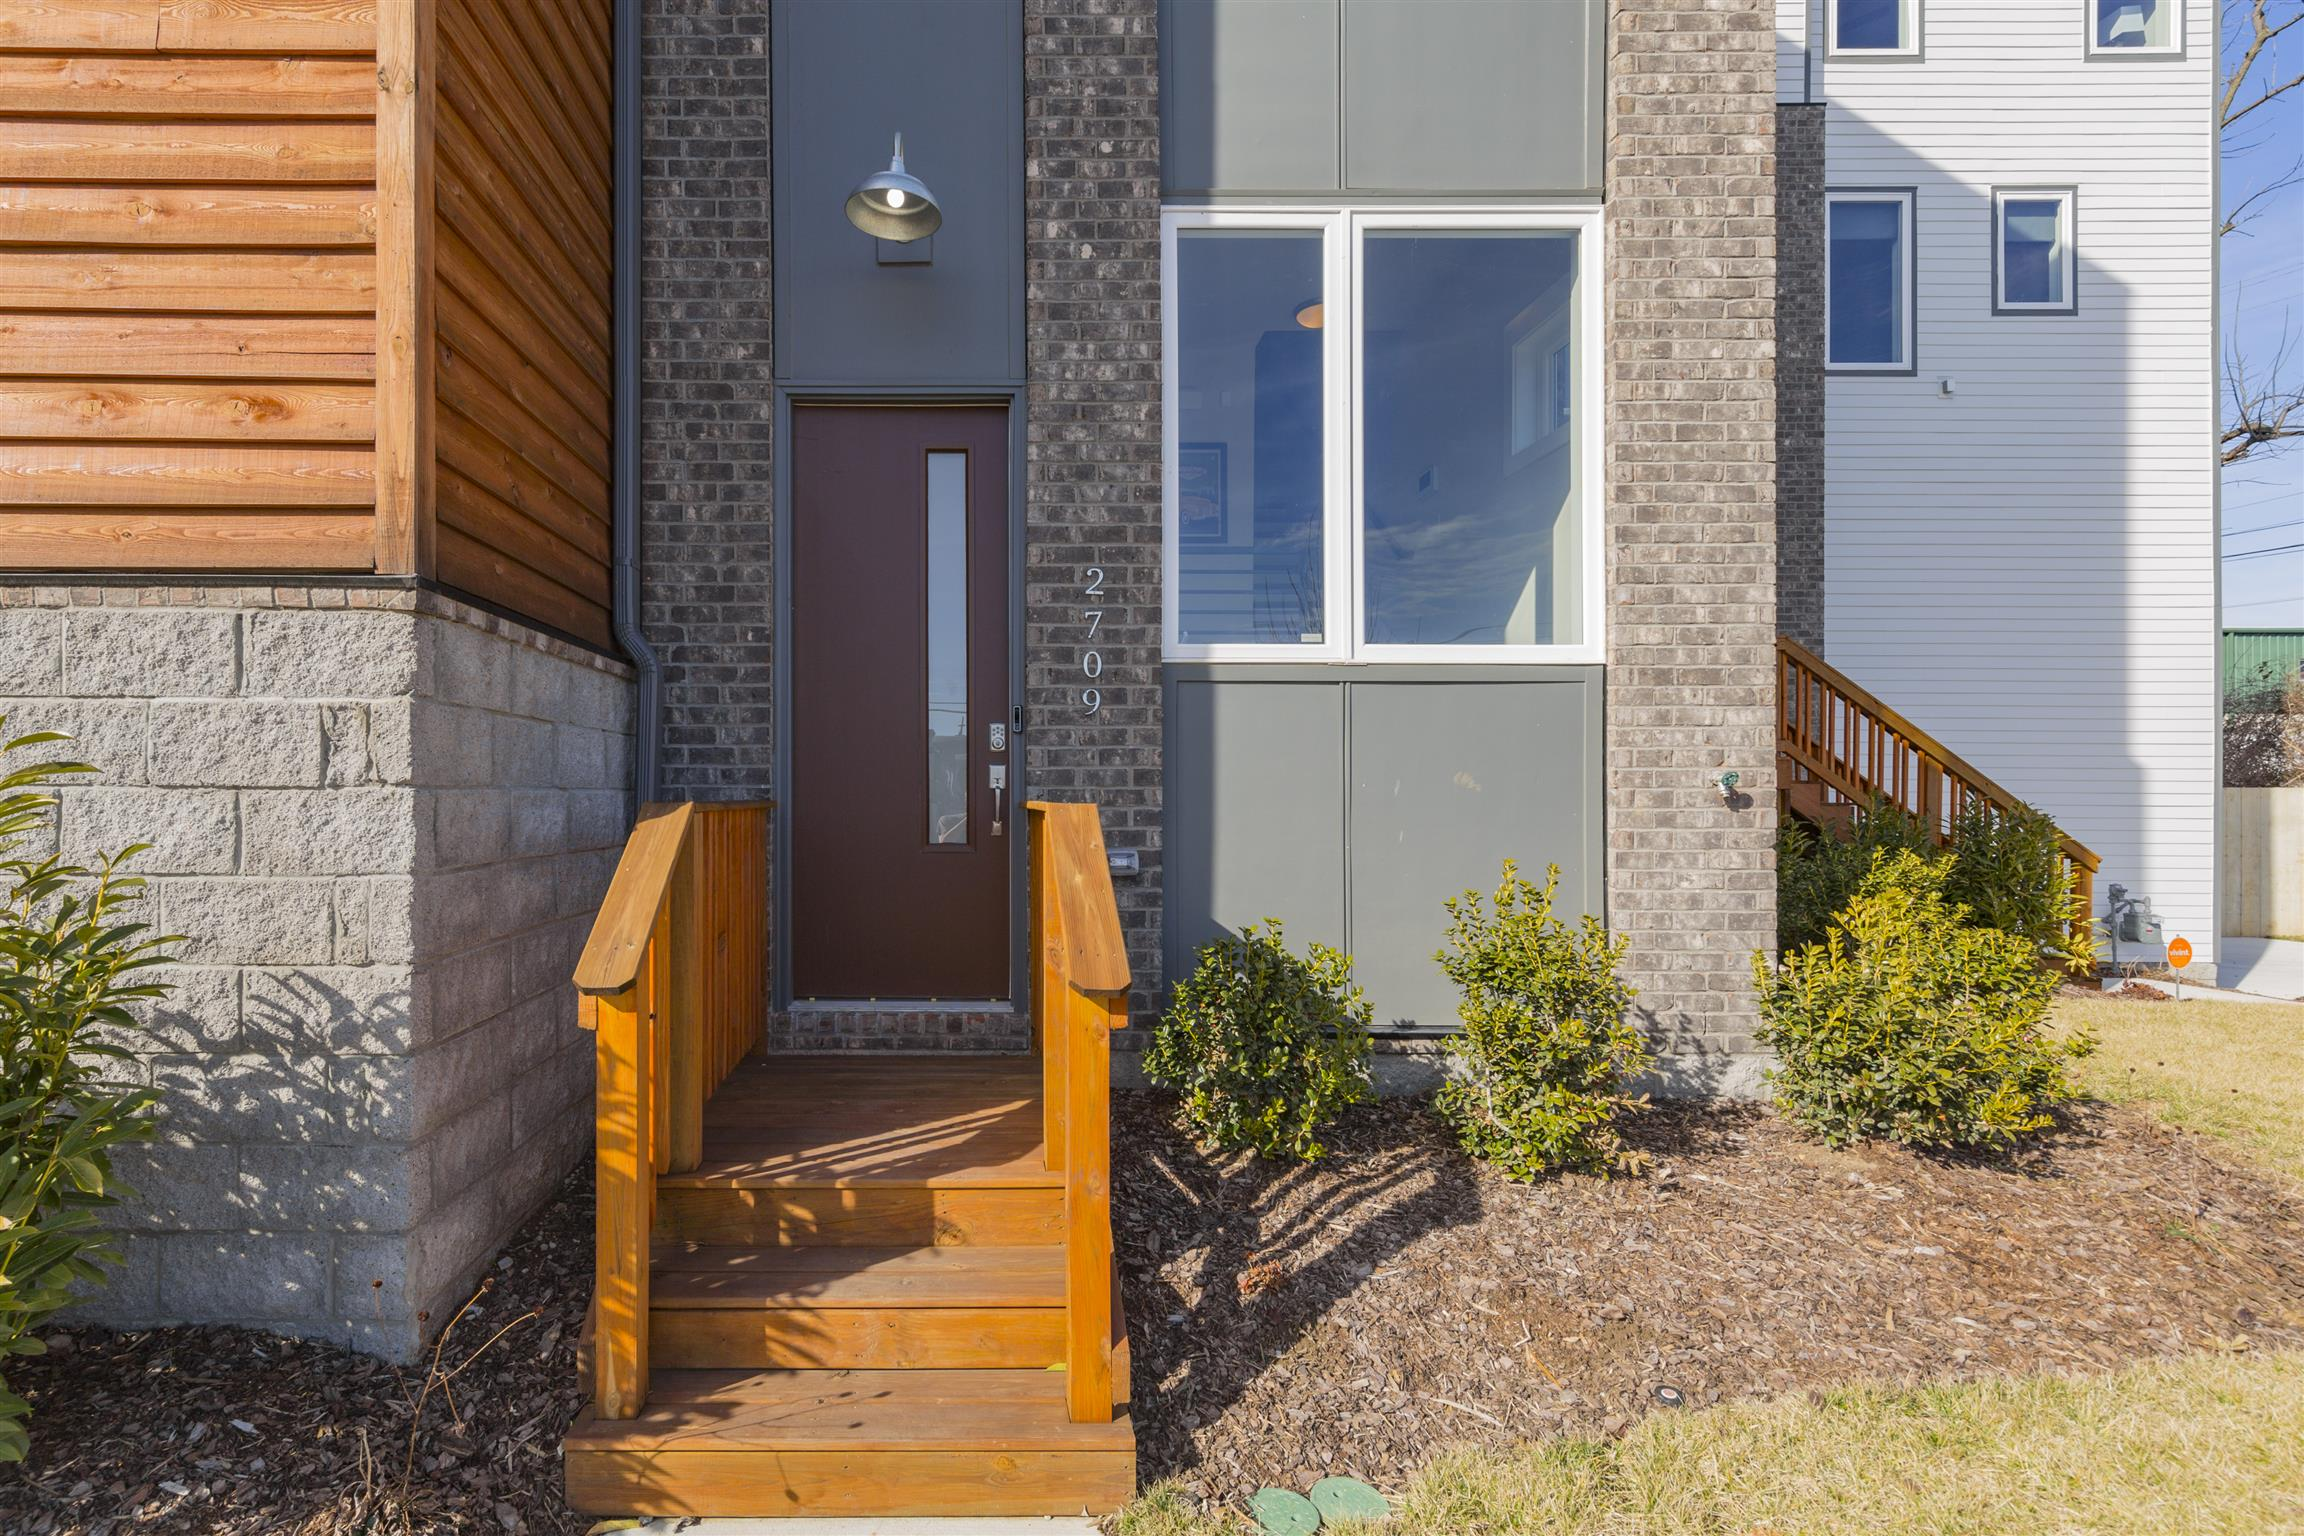 2709 Biloxi Ave, Nashville, TN 37204 - Nashville, TN real estate listing